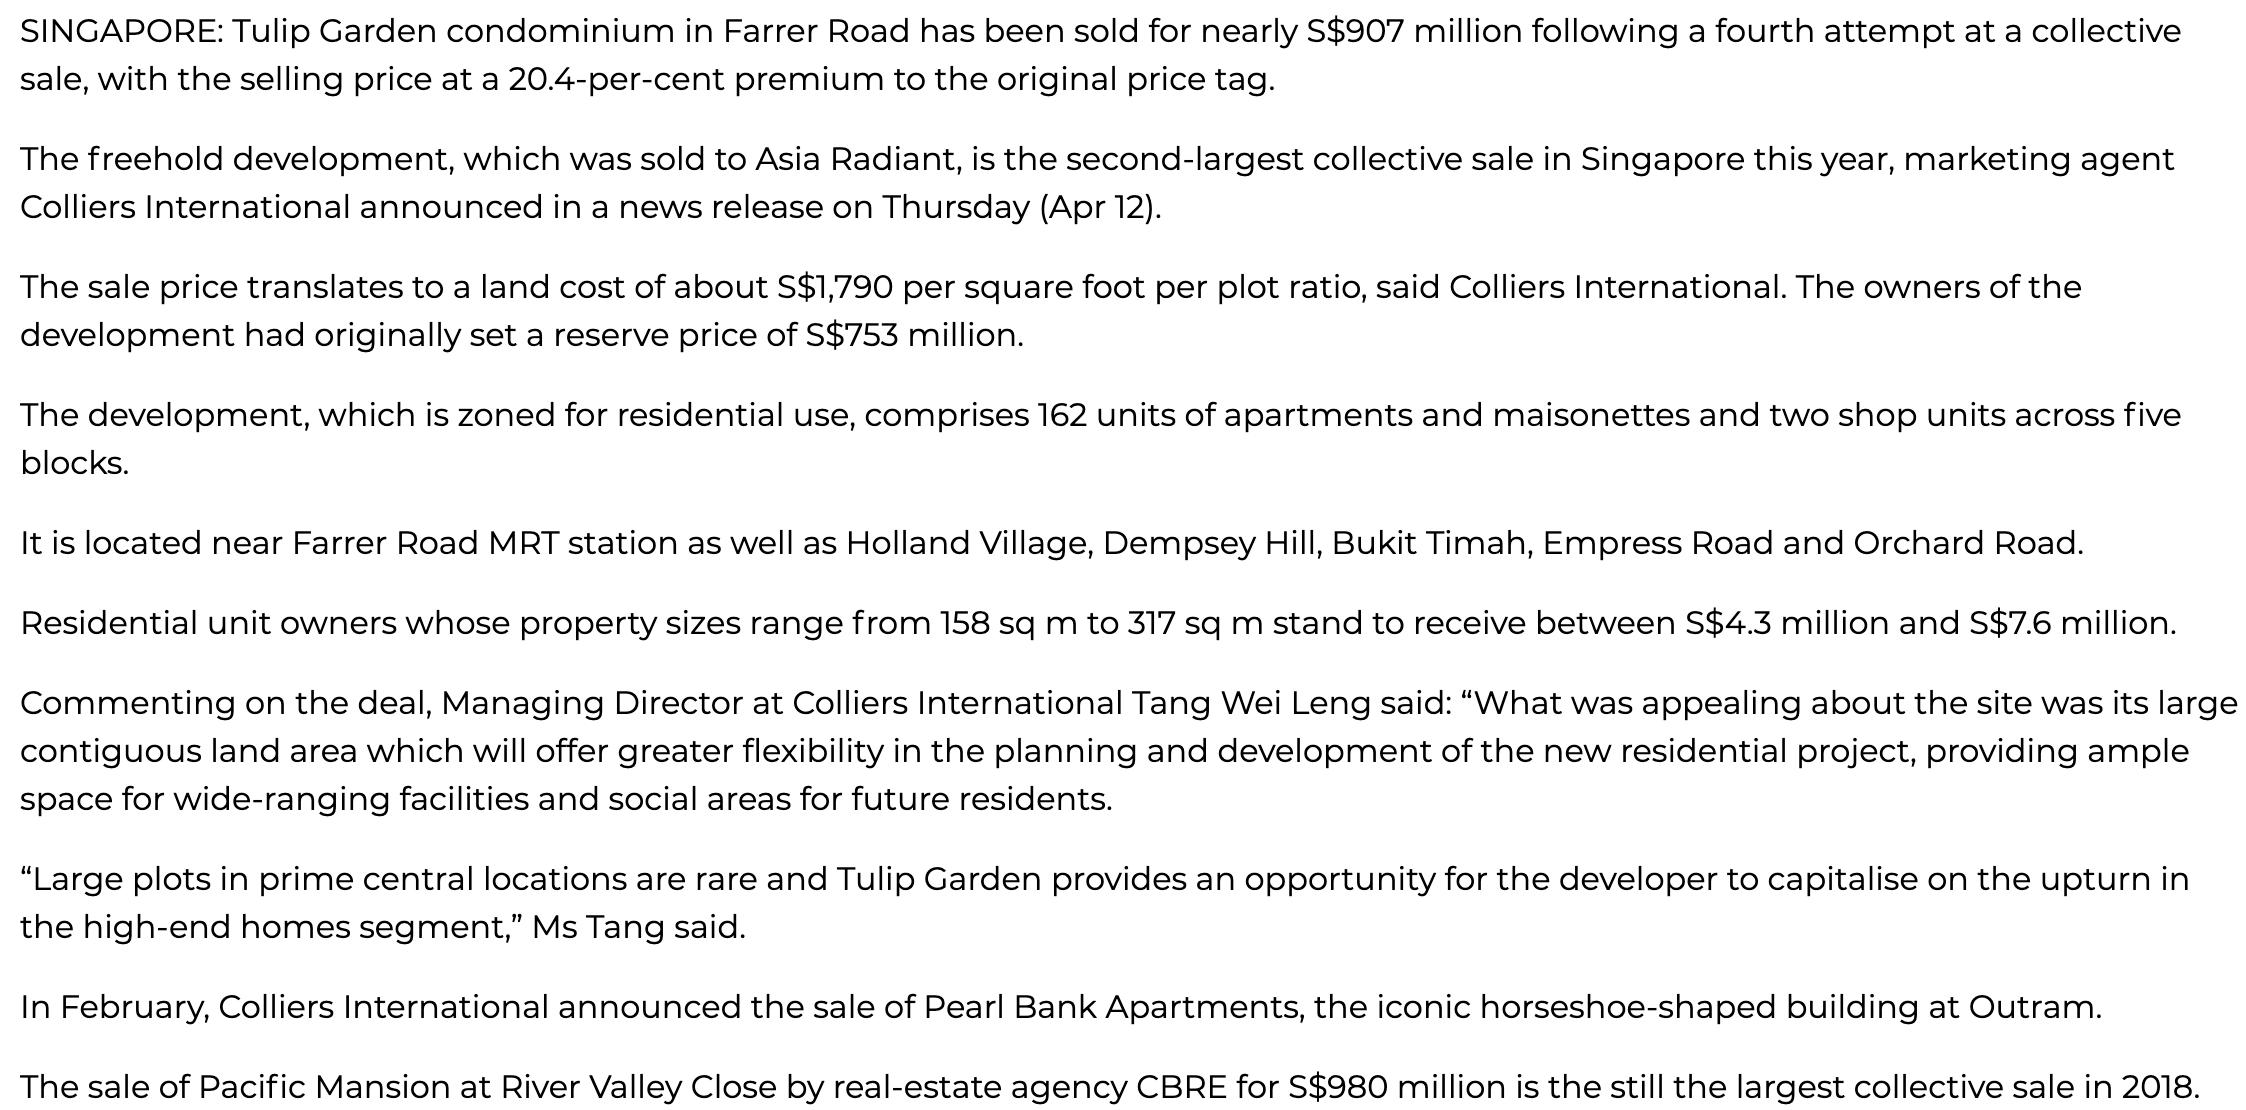 tulip-garden-sold-for-s$907m-on-fourth-en-bloc-attempt